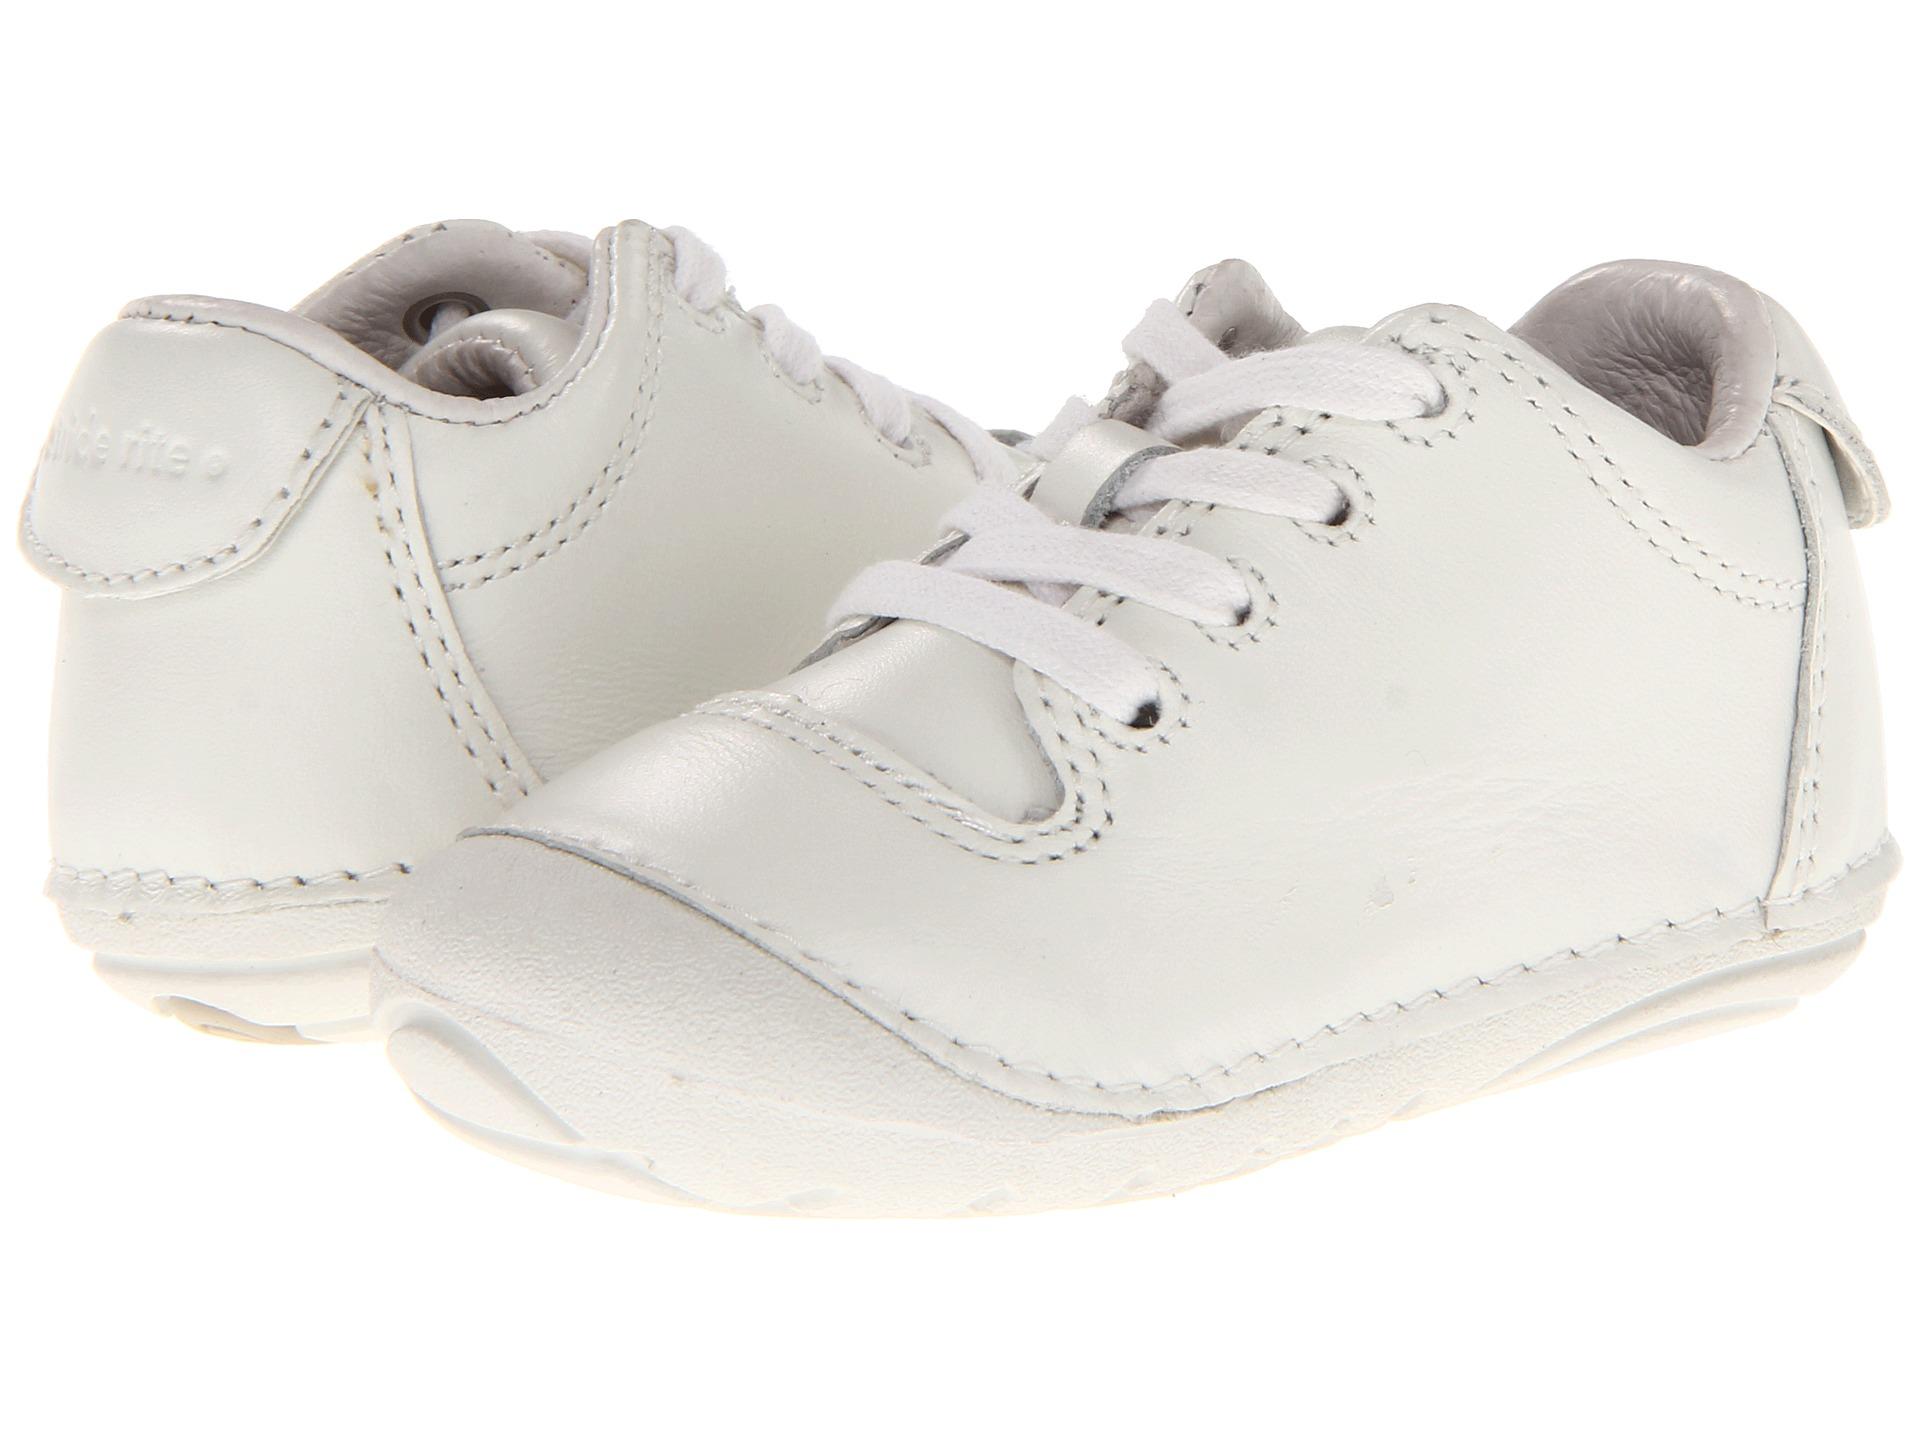 Flexible Walking Shoes For Babies